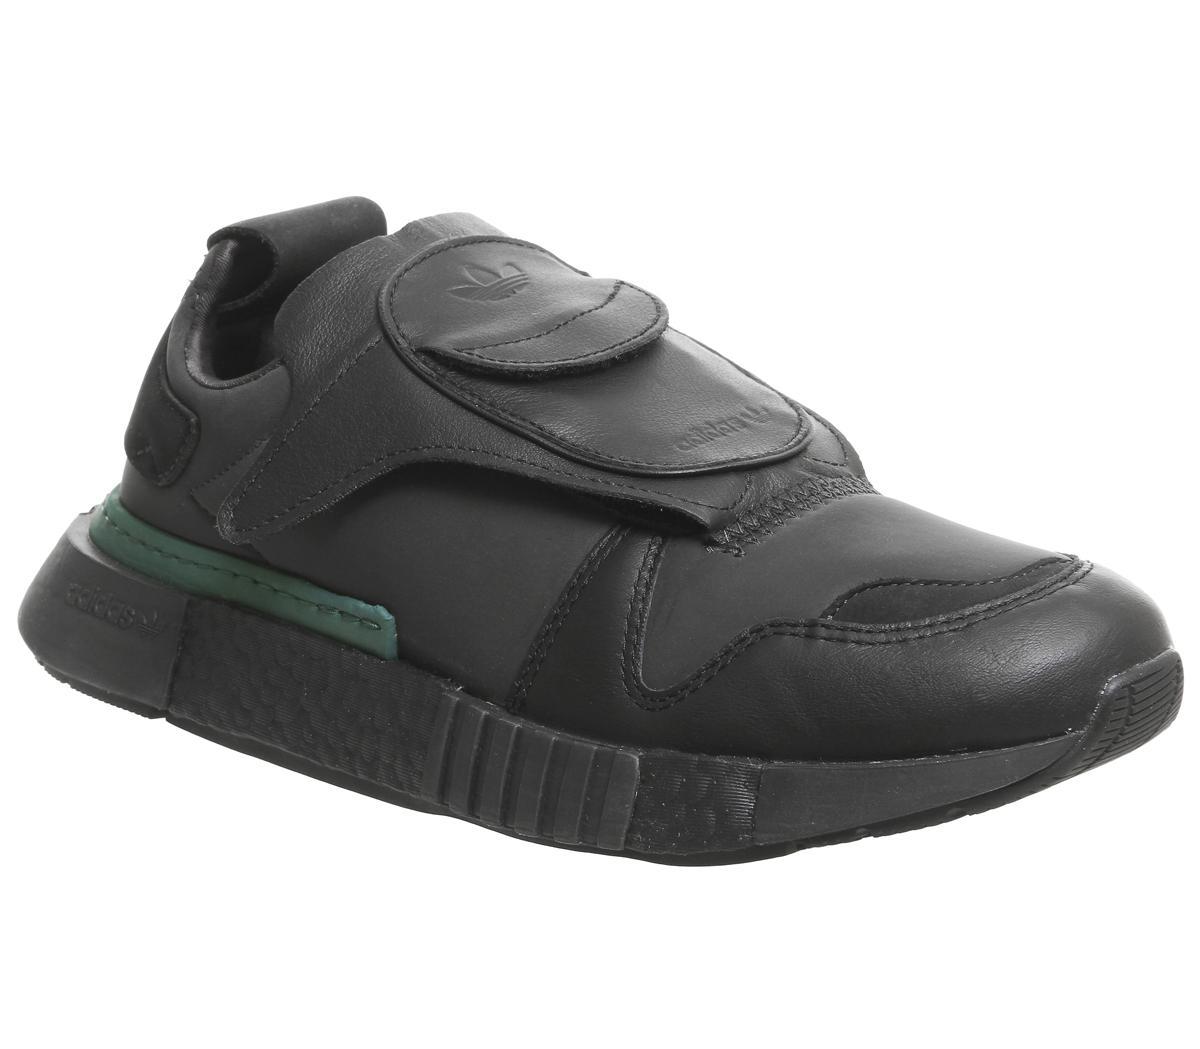 social arrastrar Desagradable  adidas Futurepacer Trainers Core Black Carbon White - His trainers